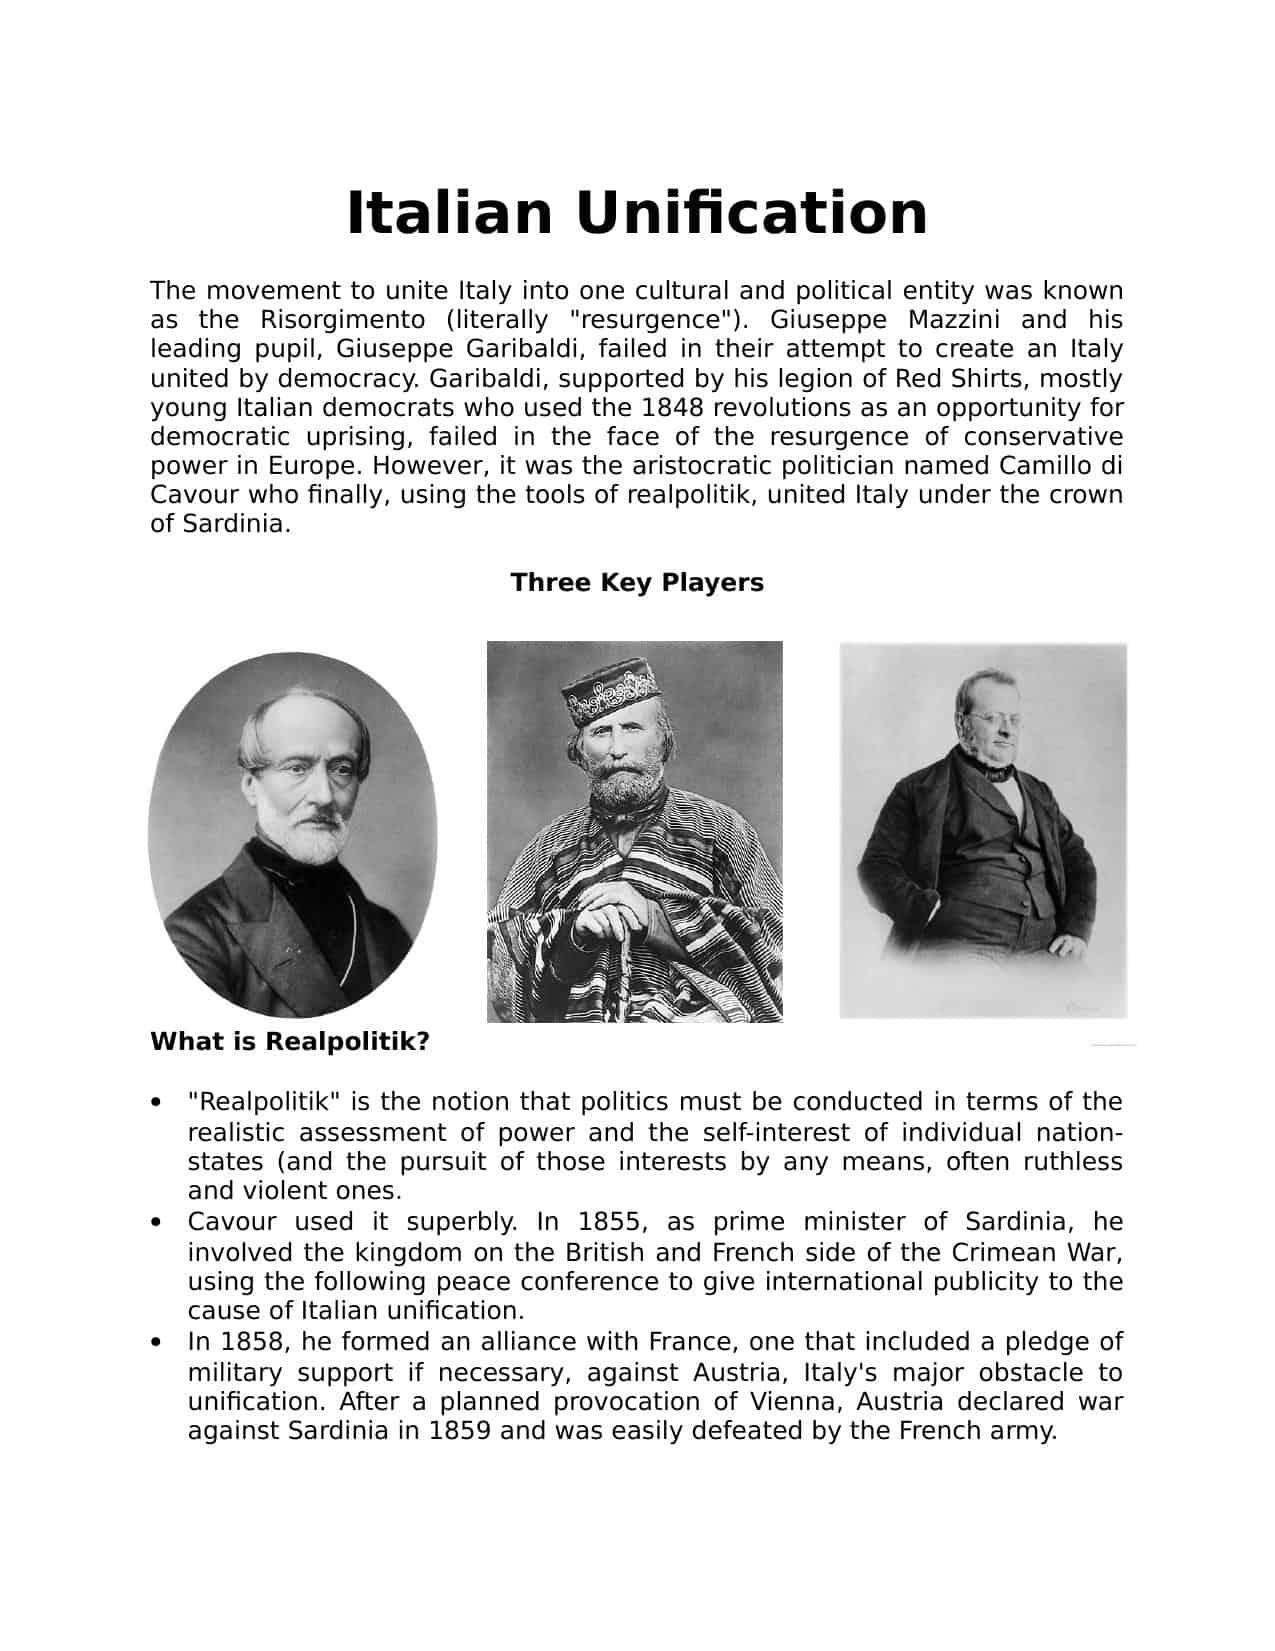 Italian Unification Worksheet